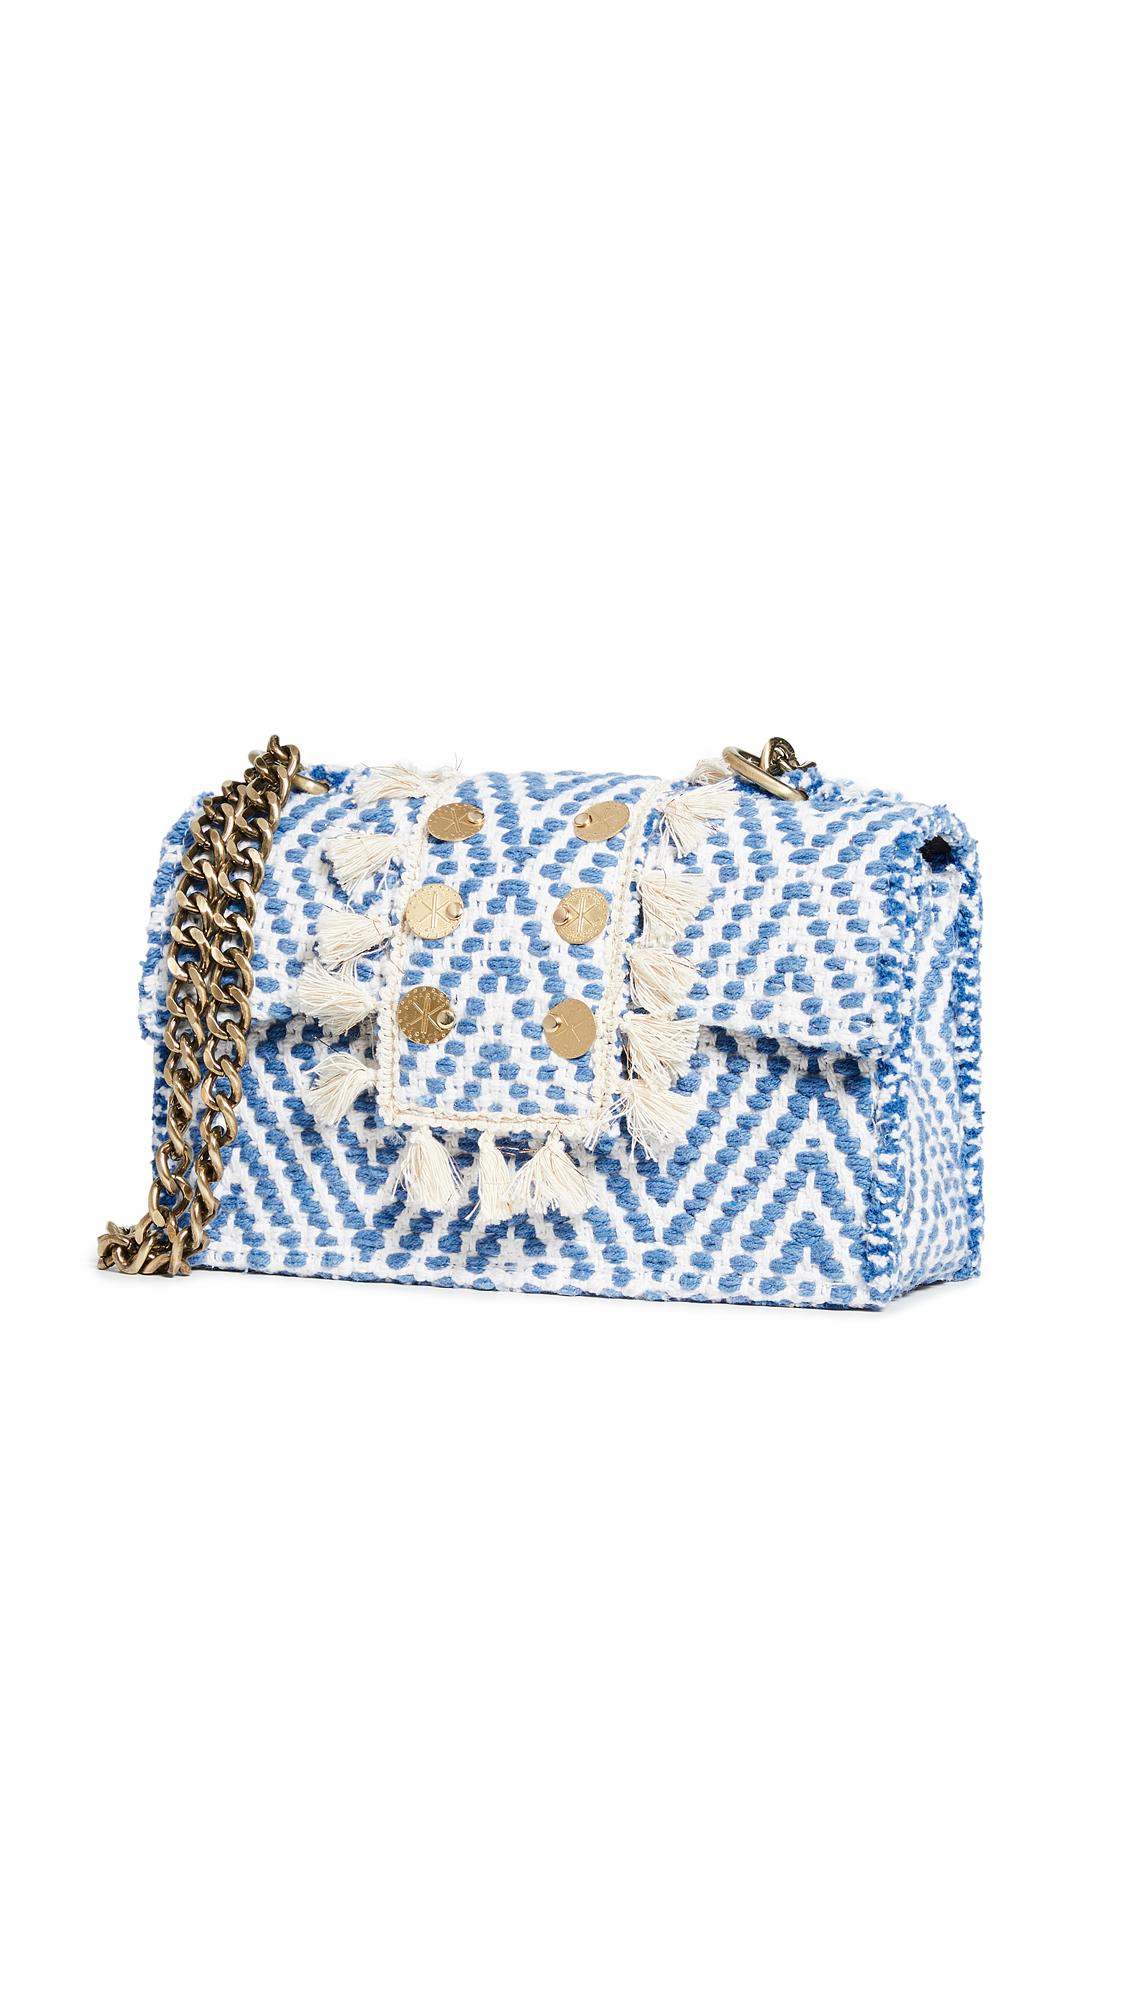 Kooreloo New Yorker Soho Cali Bag In Blue